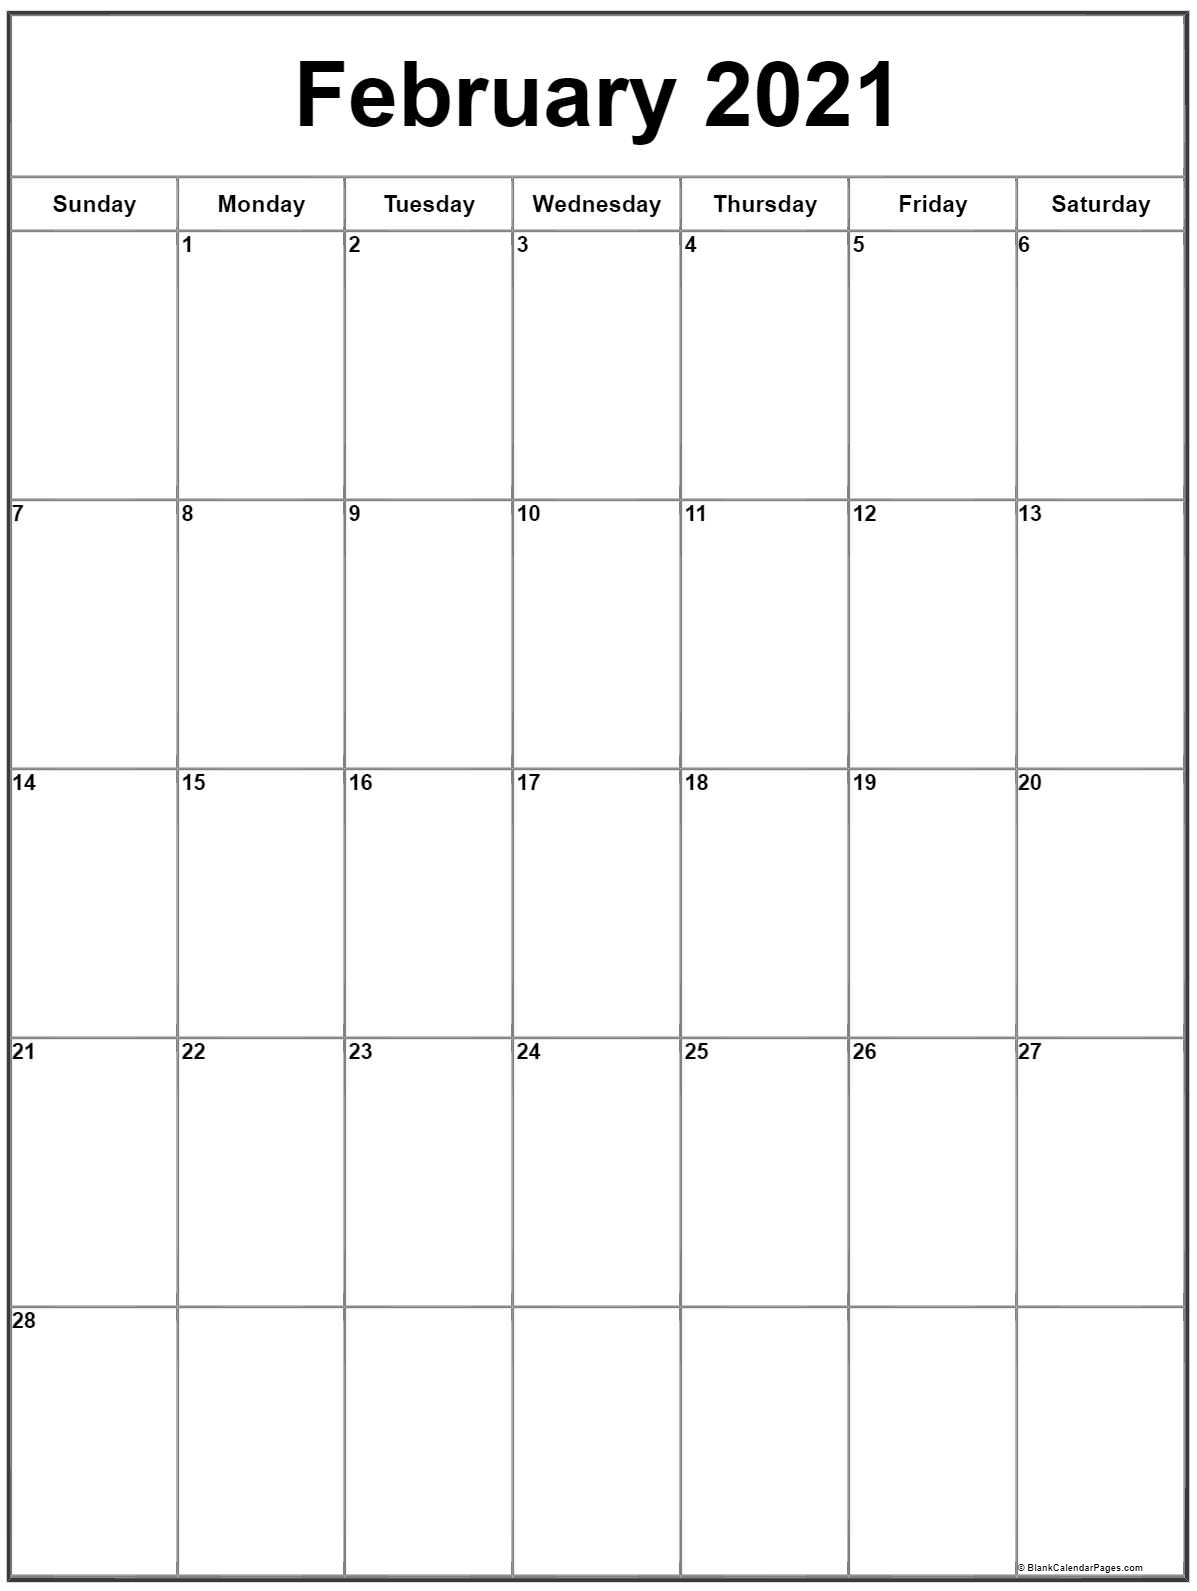 February 2021 Vertical Calendar | Portrait